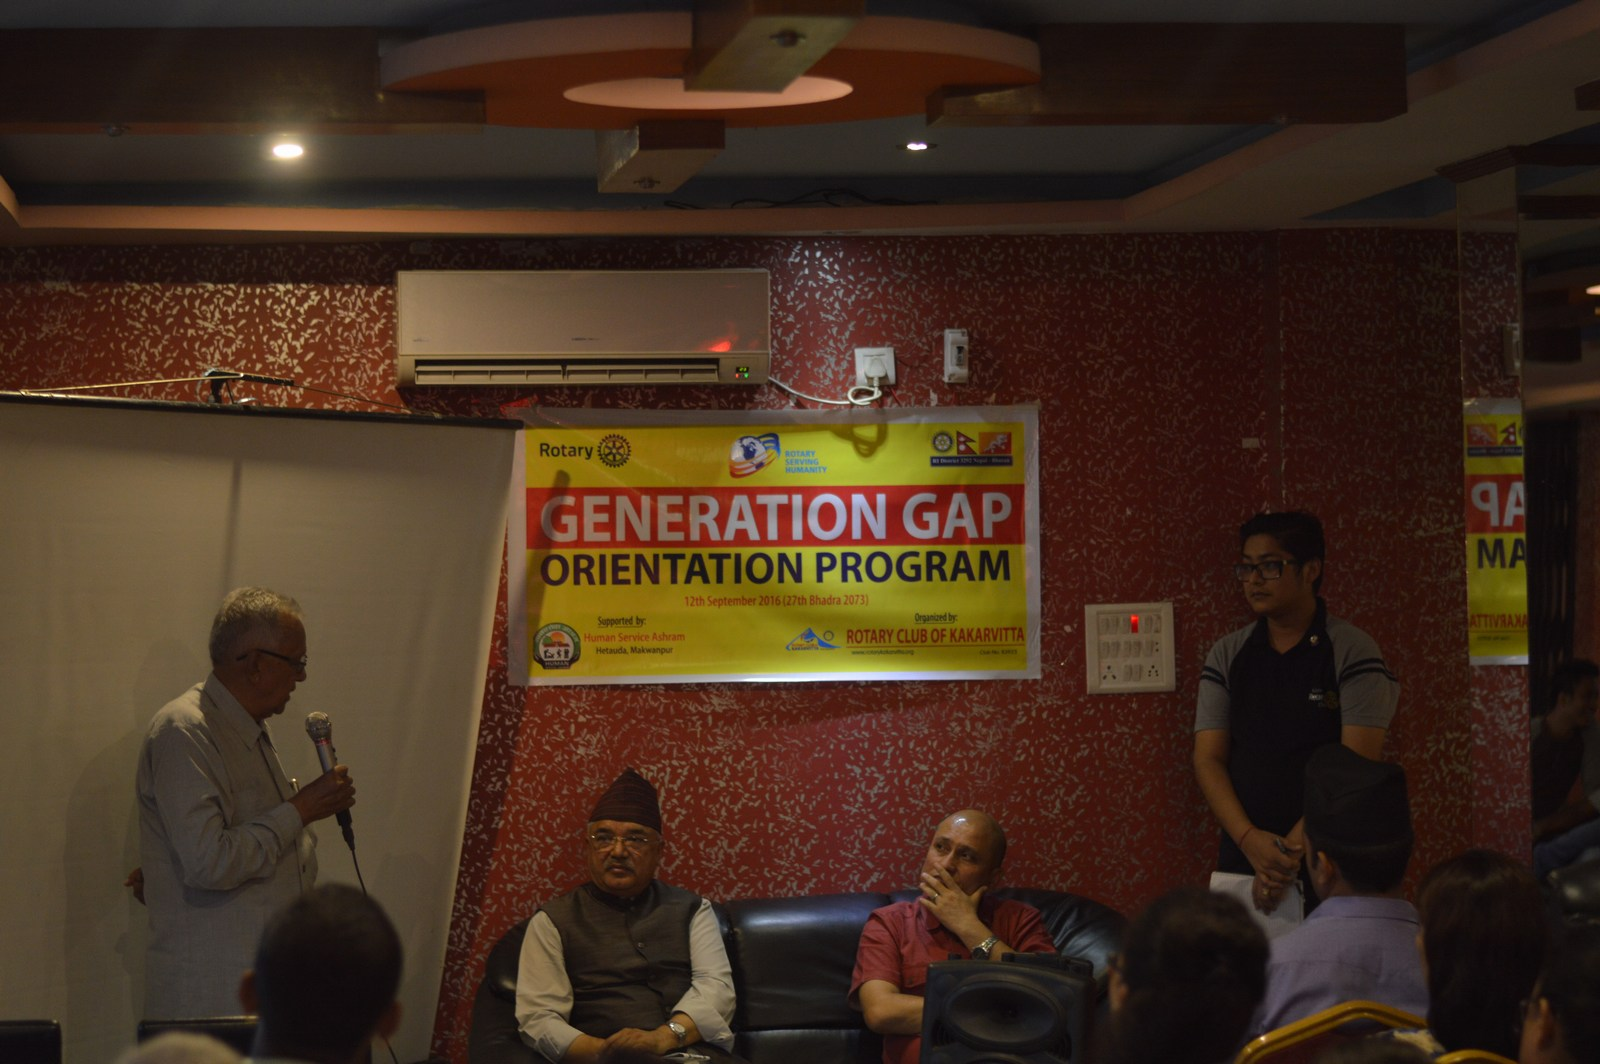 Generation-Gap-Orientation-Program-Rotary-Club-of-Kakarvitta-25